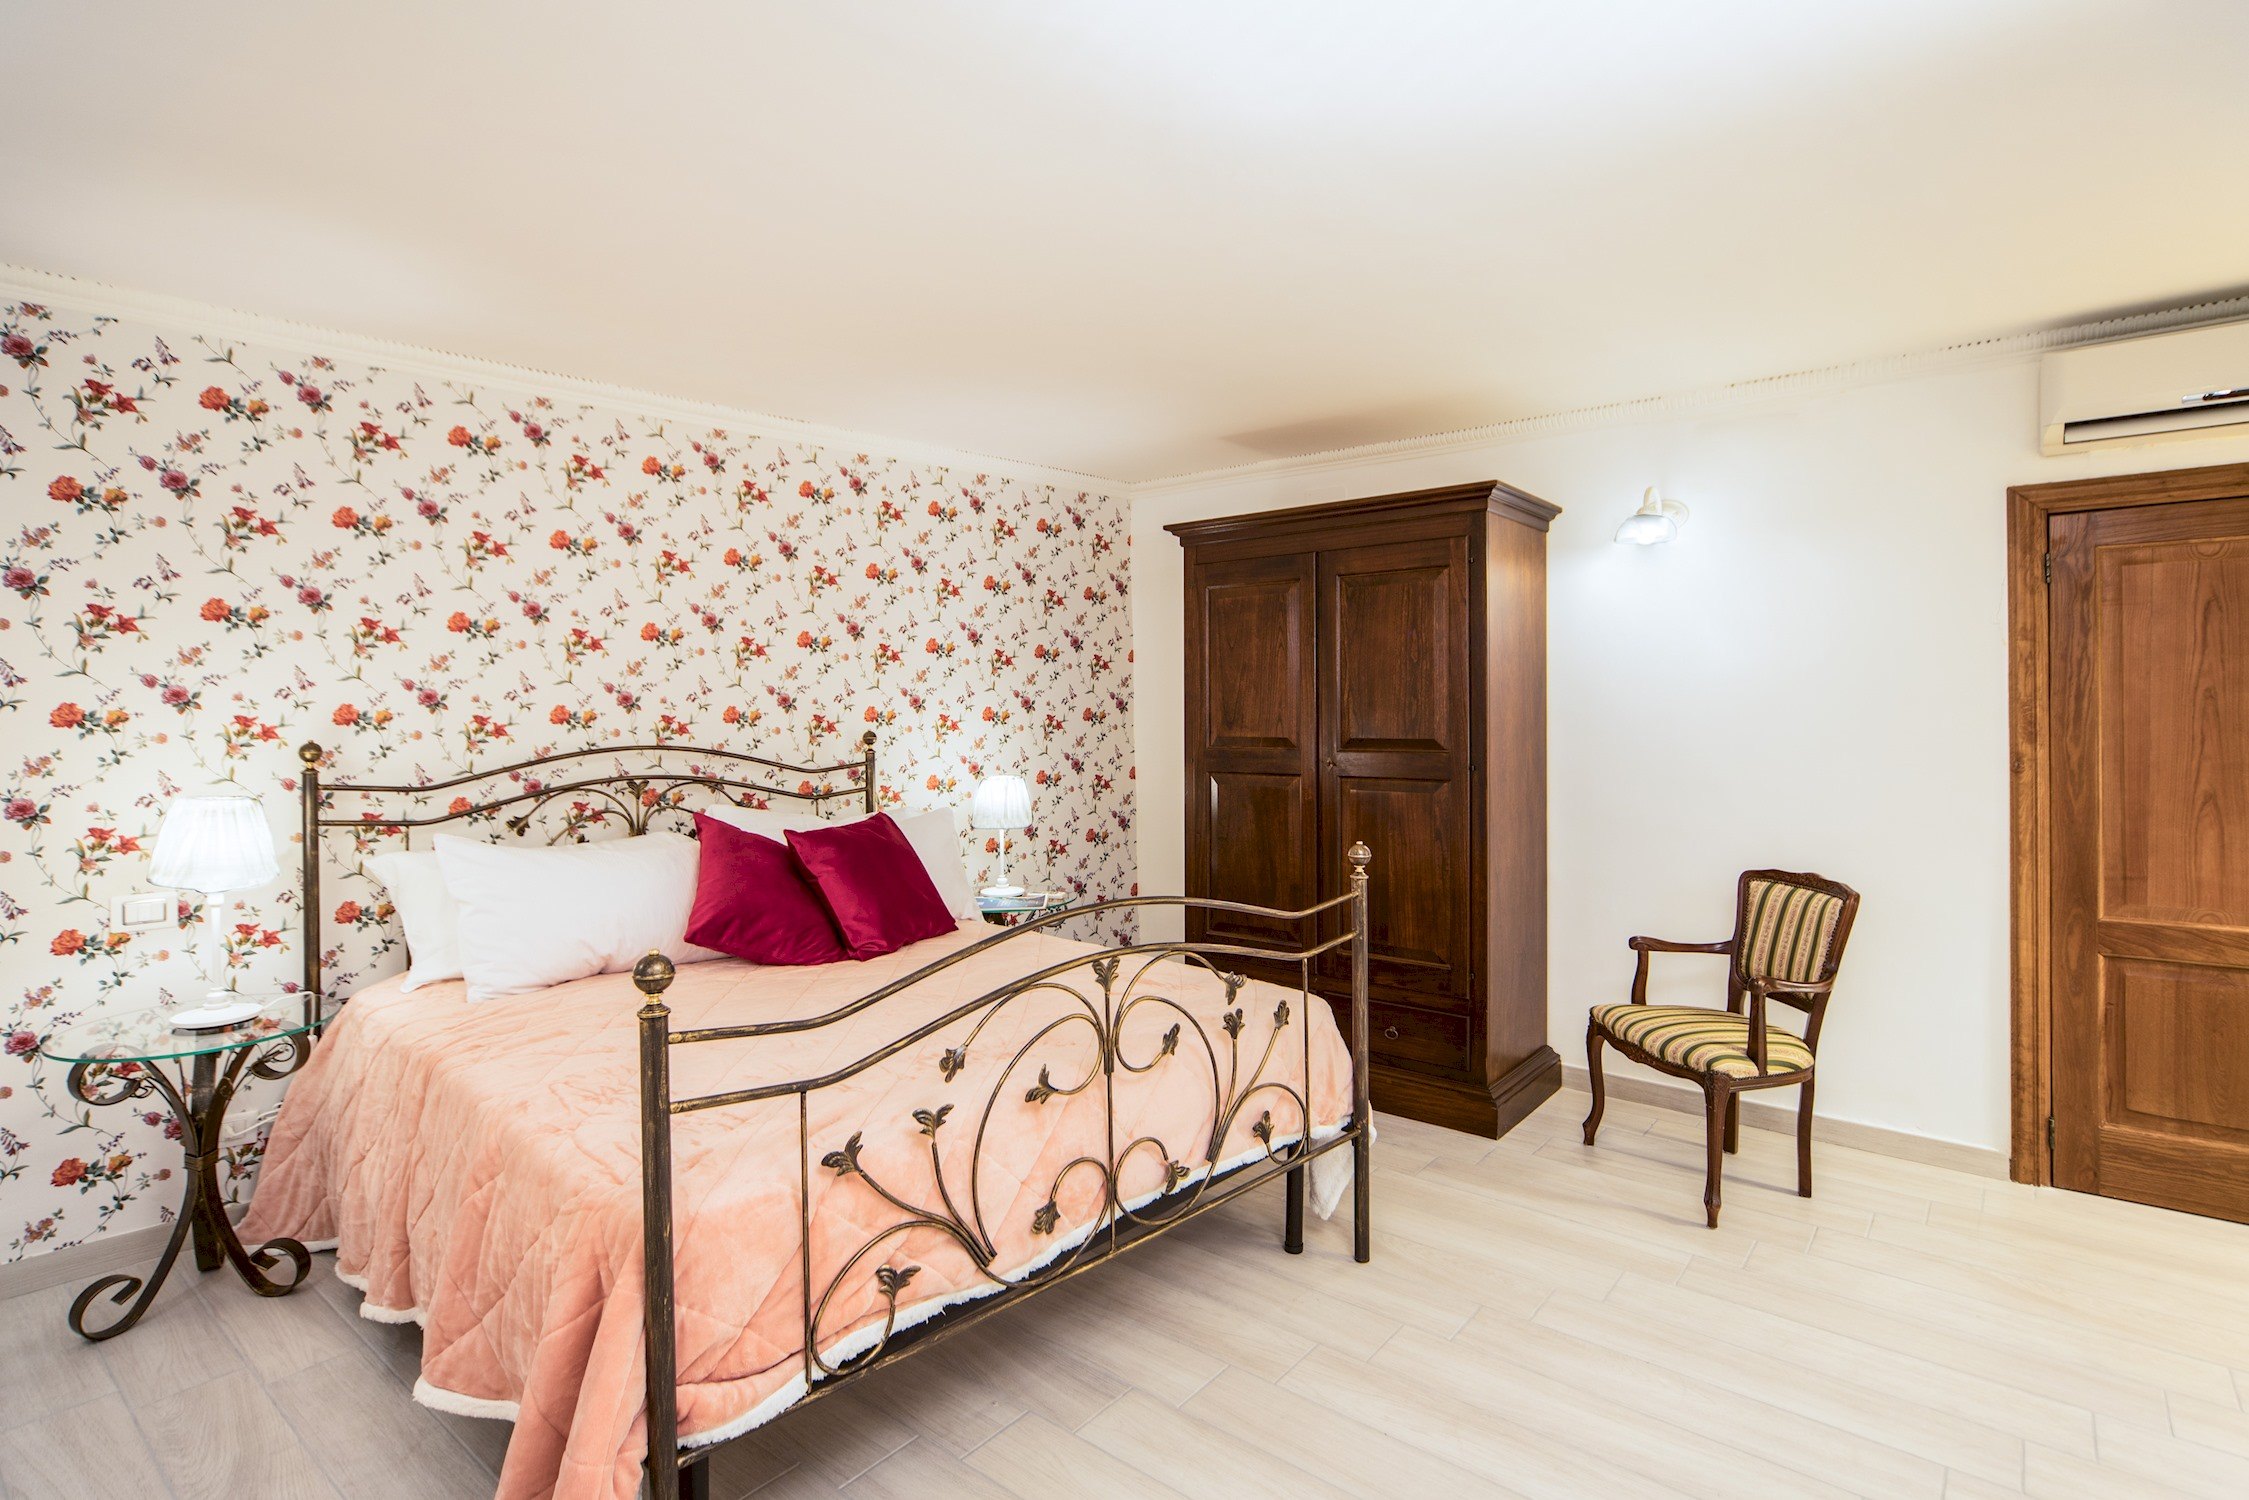 Apartment La Casa di Assunta - Naples Historical Centre photo 19137800